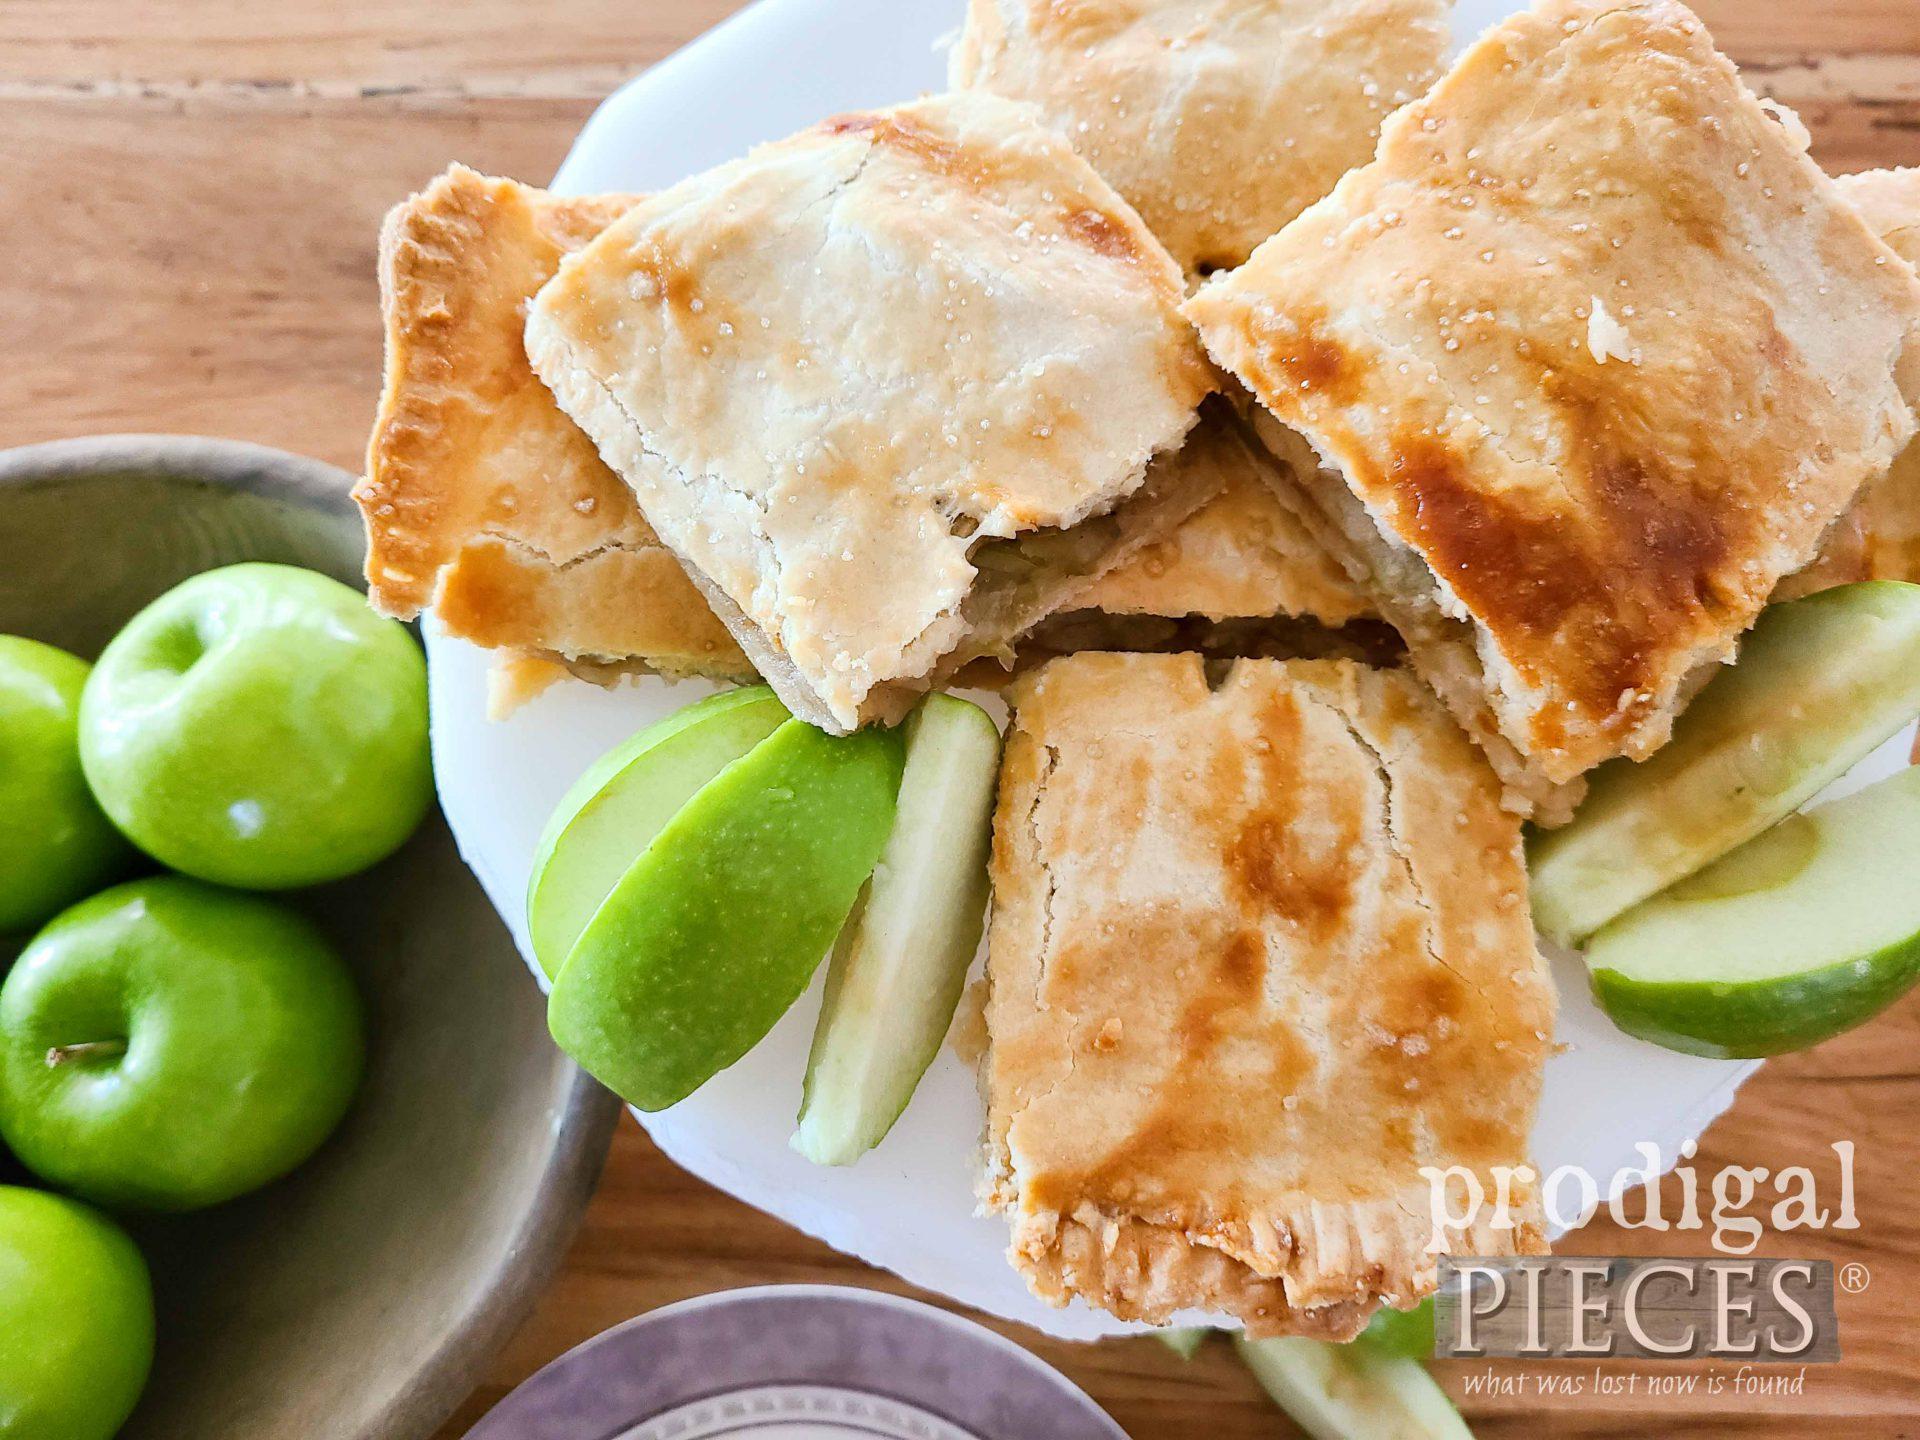 Stacks of Apple Jack Dessert with Recipe by Larissa of Prodigal Pieces   prodigalpieces.com #prodigalpieces #food #recipe #dessert #apple #baking